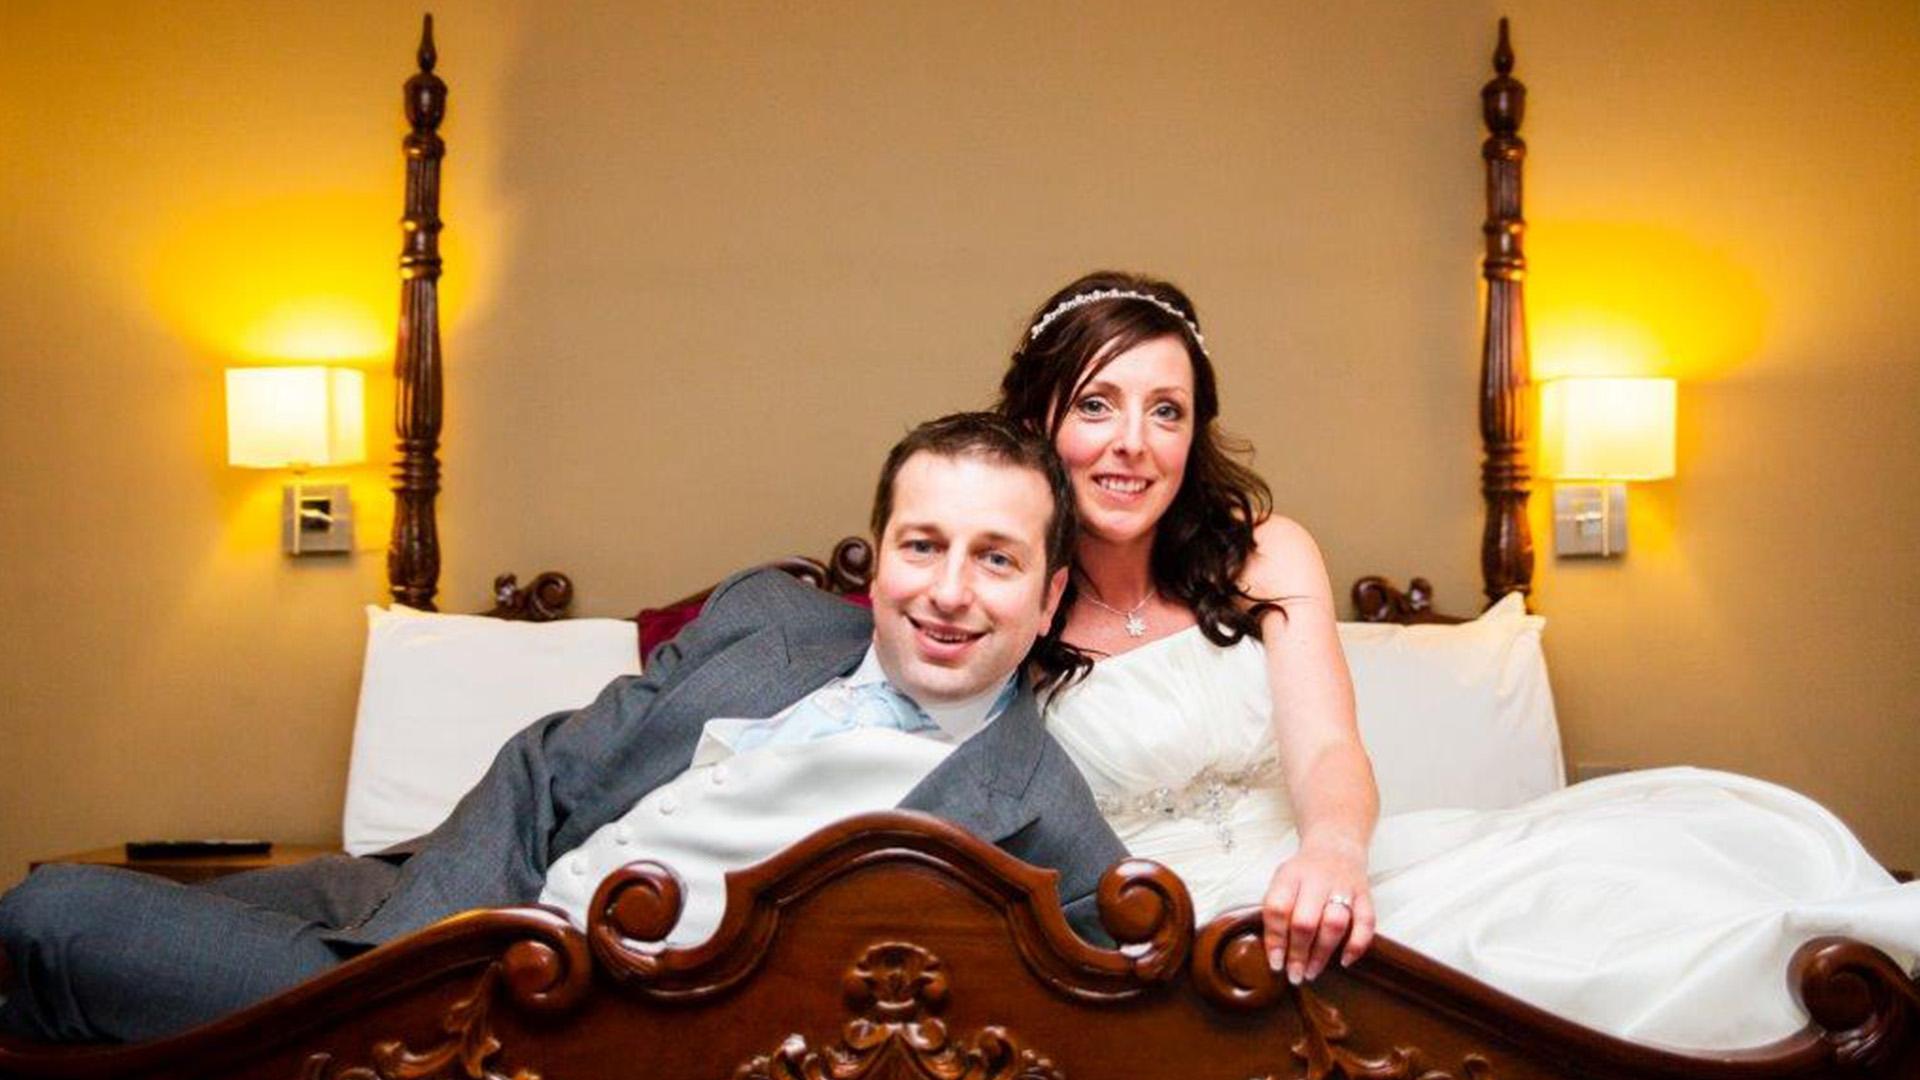 Wedding Venues in Hampshire Mercure Southampton Centre Dolphin Hotel Honeymoon Suite 3